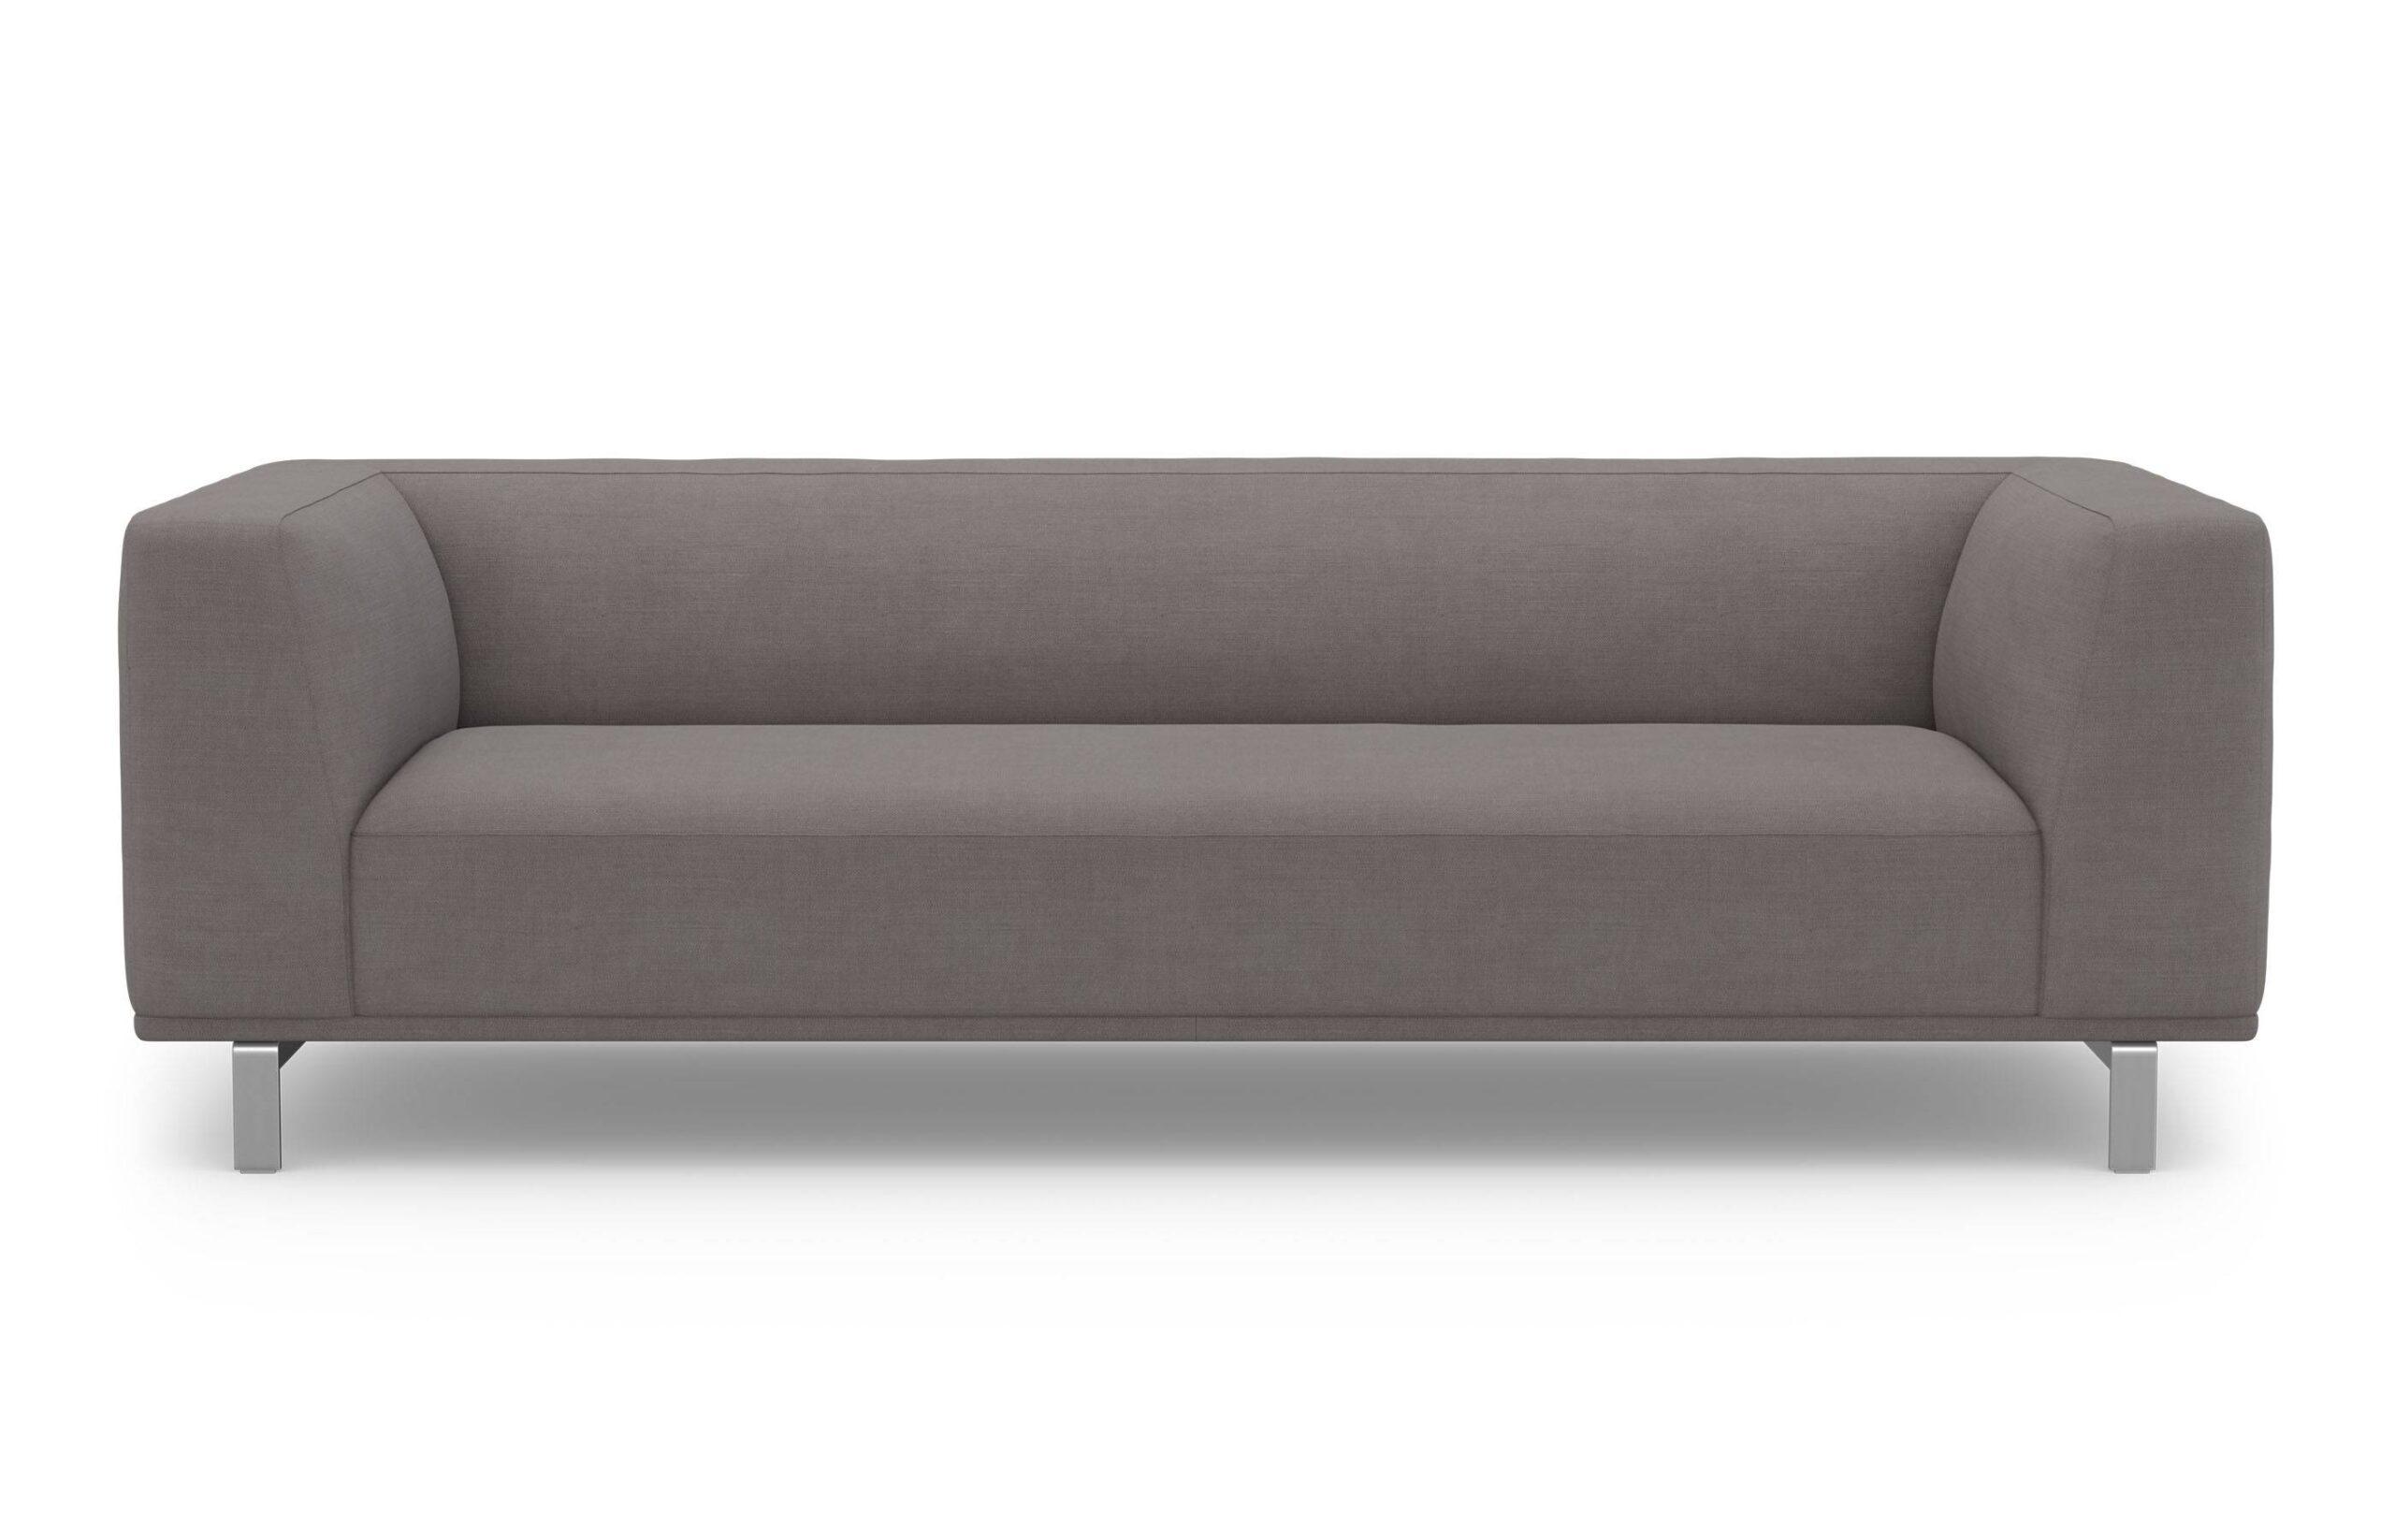 Full Size of Sofa 3 Sitzer Grau 3 Sitzer Nino Schwarz/grau Rattan Couch 2 Und Louisiana (3 Sitzer Mit Polster Grau) Ikea Samt View Sitzfeldtcom Big Günstig Boxspring Sofa Sofa 3 Sitzer Grau